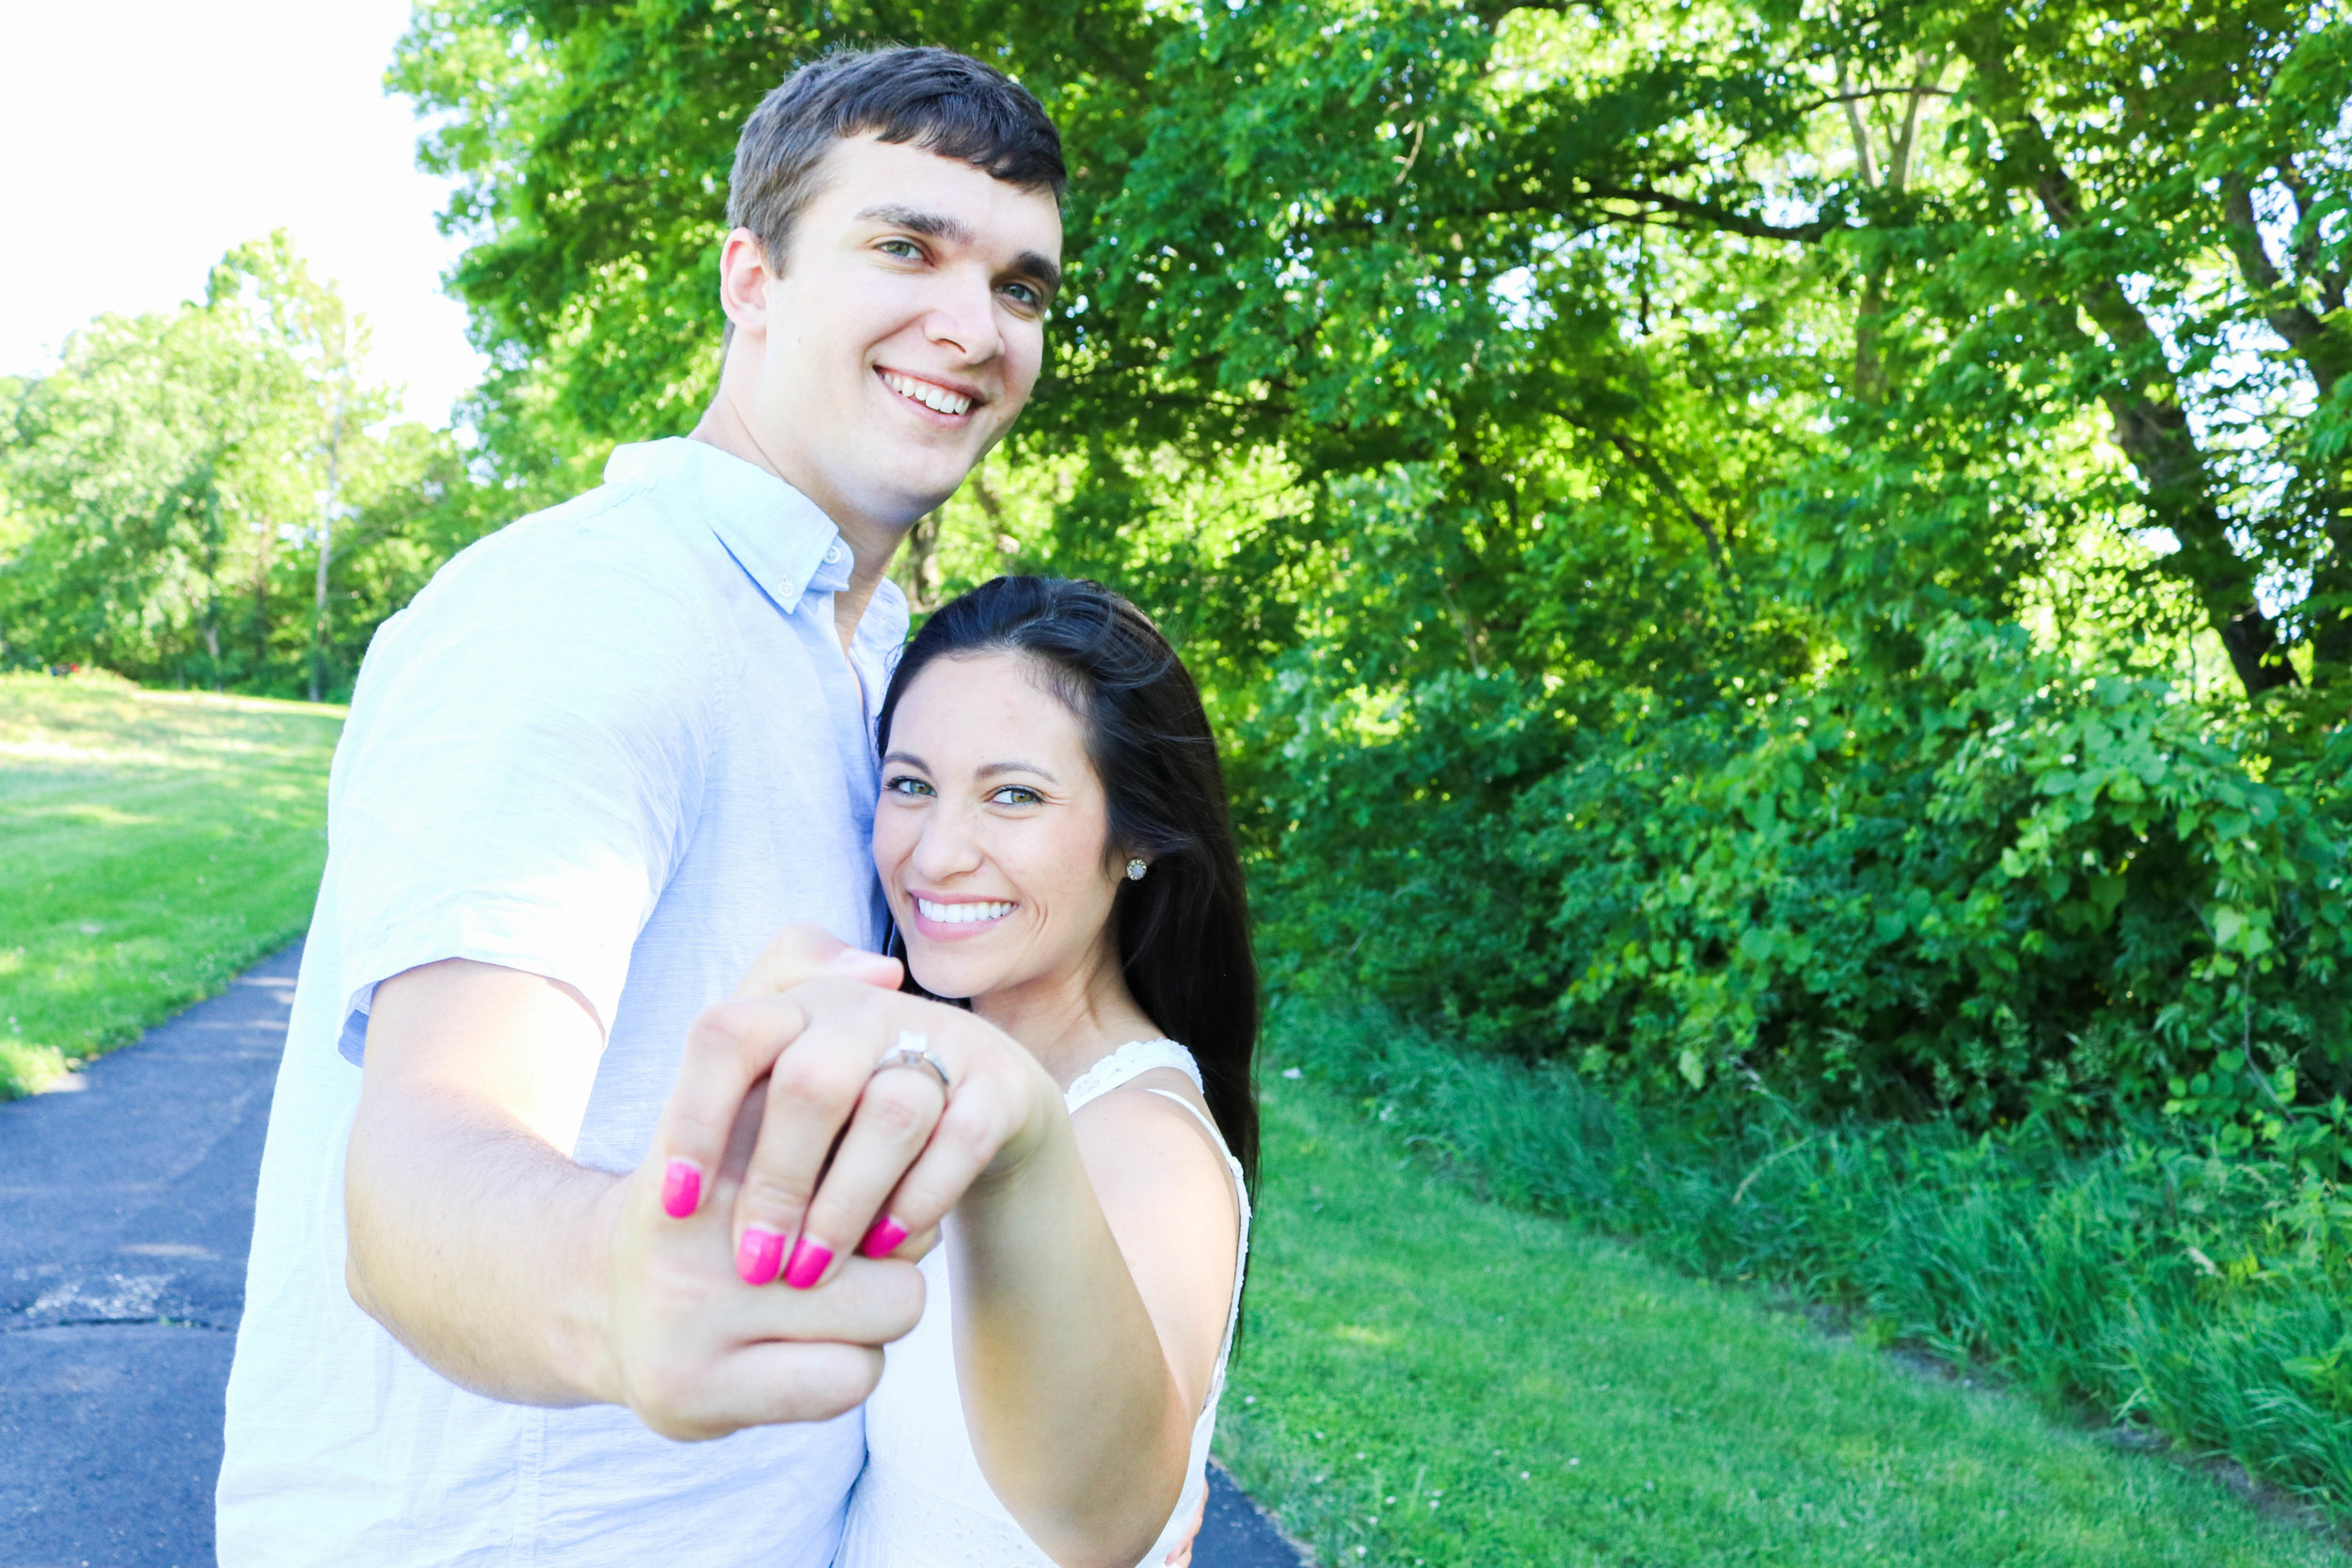 Brianna + Michael | Summer 2018 | Shawnee Mission Park Trail | Engagement Session